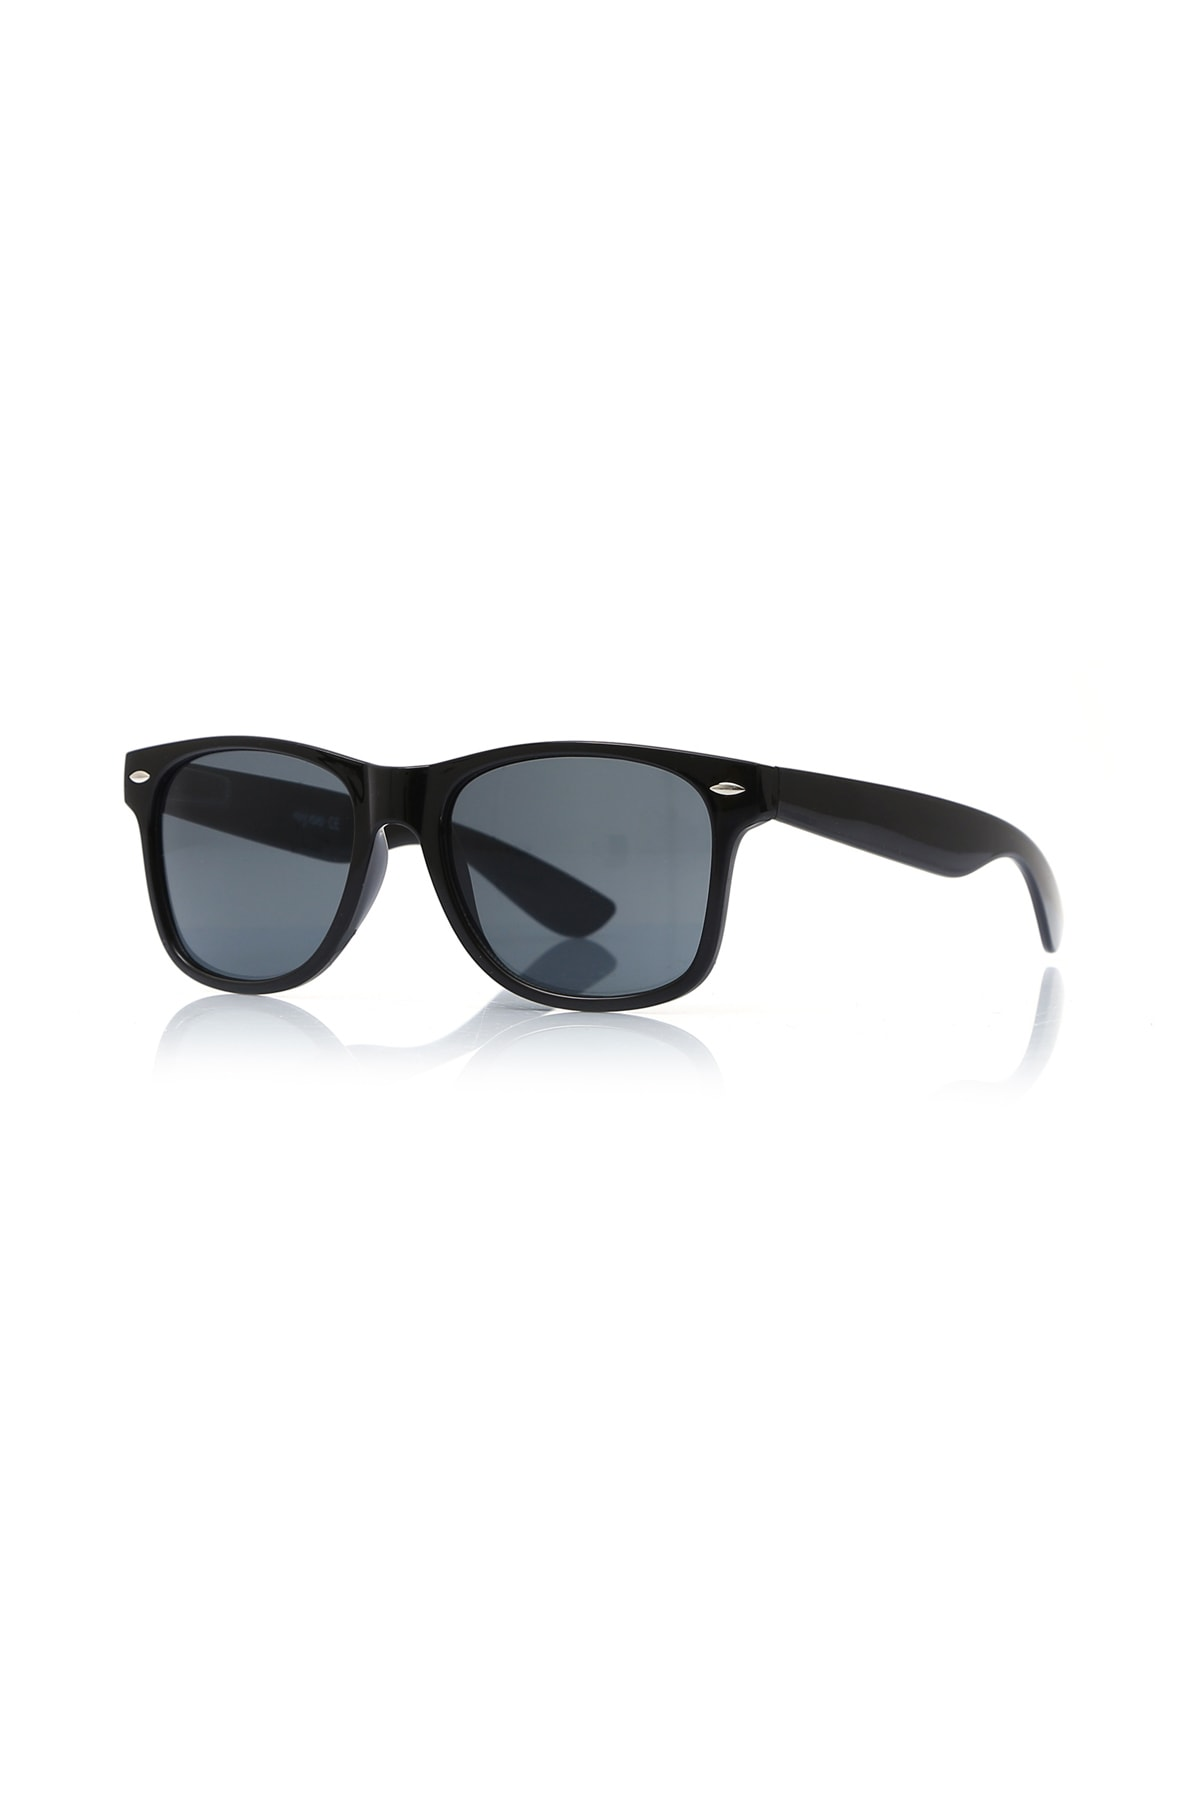 ژورنال عینک آفتابی زنانه برند By Nini رنگ مشکی کد ty36698198